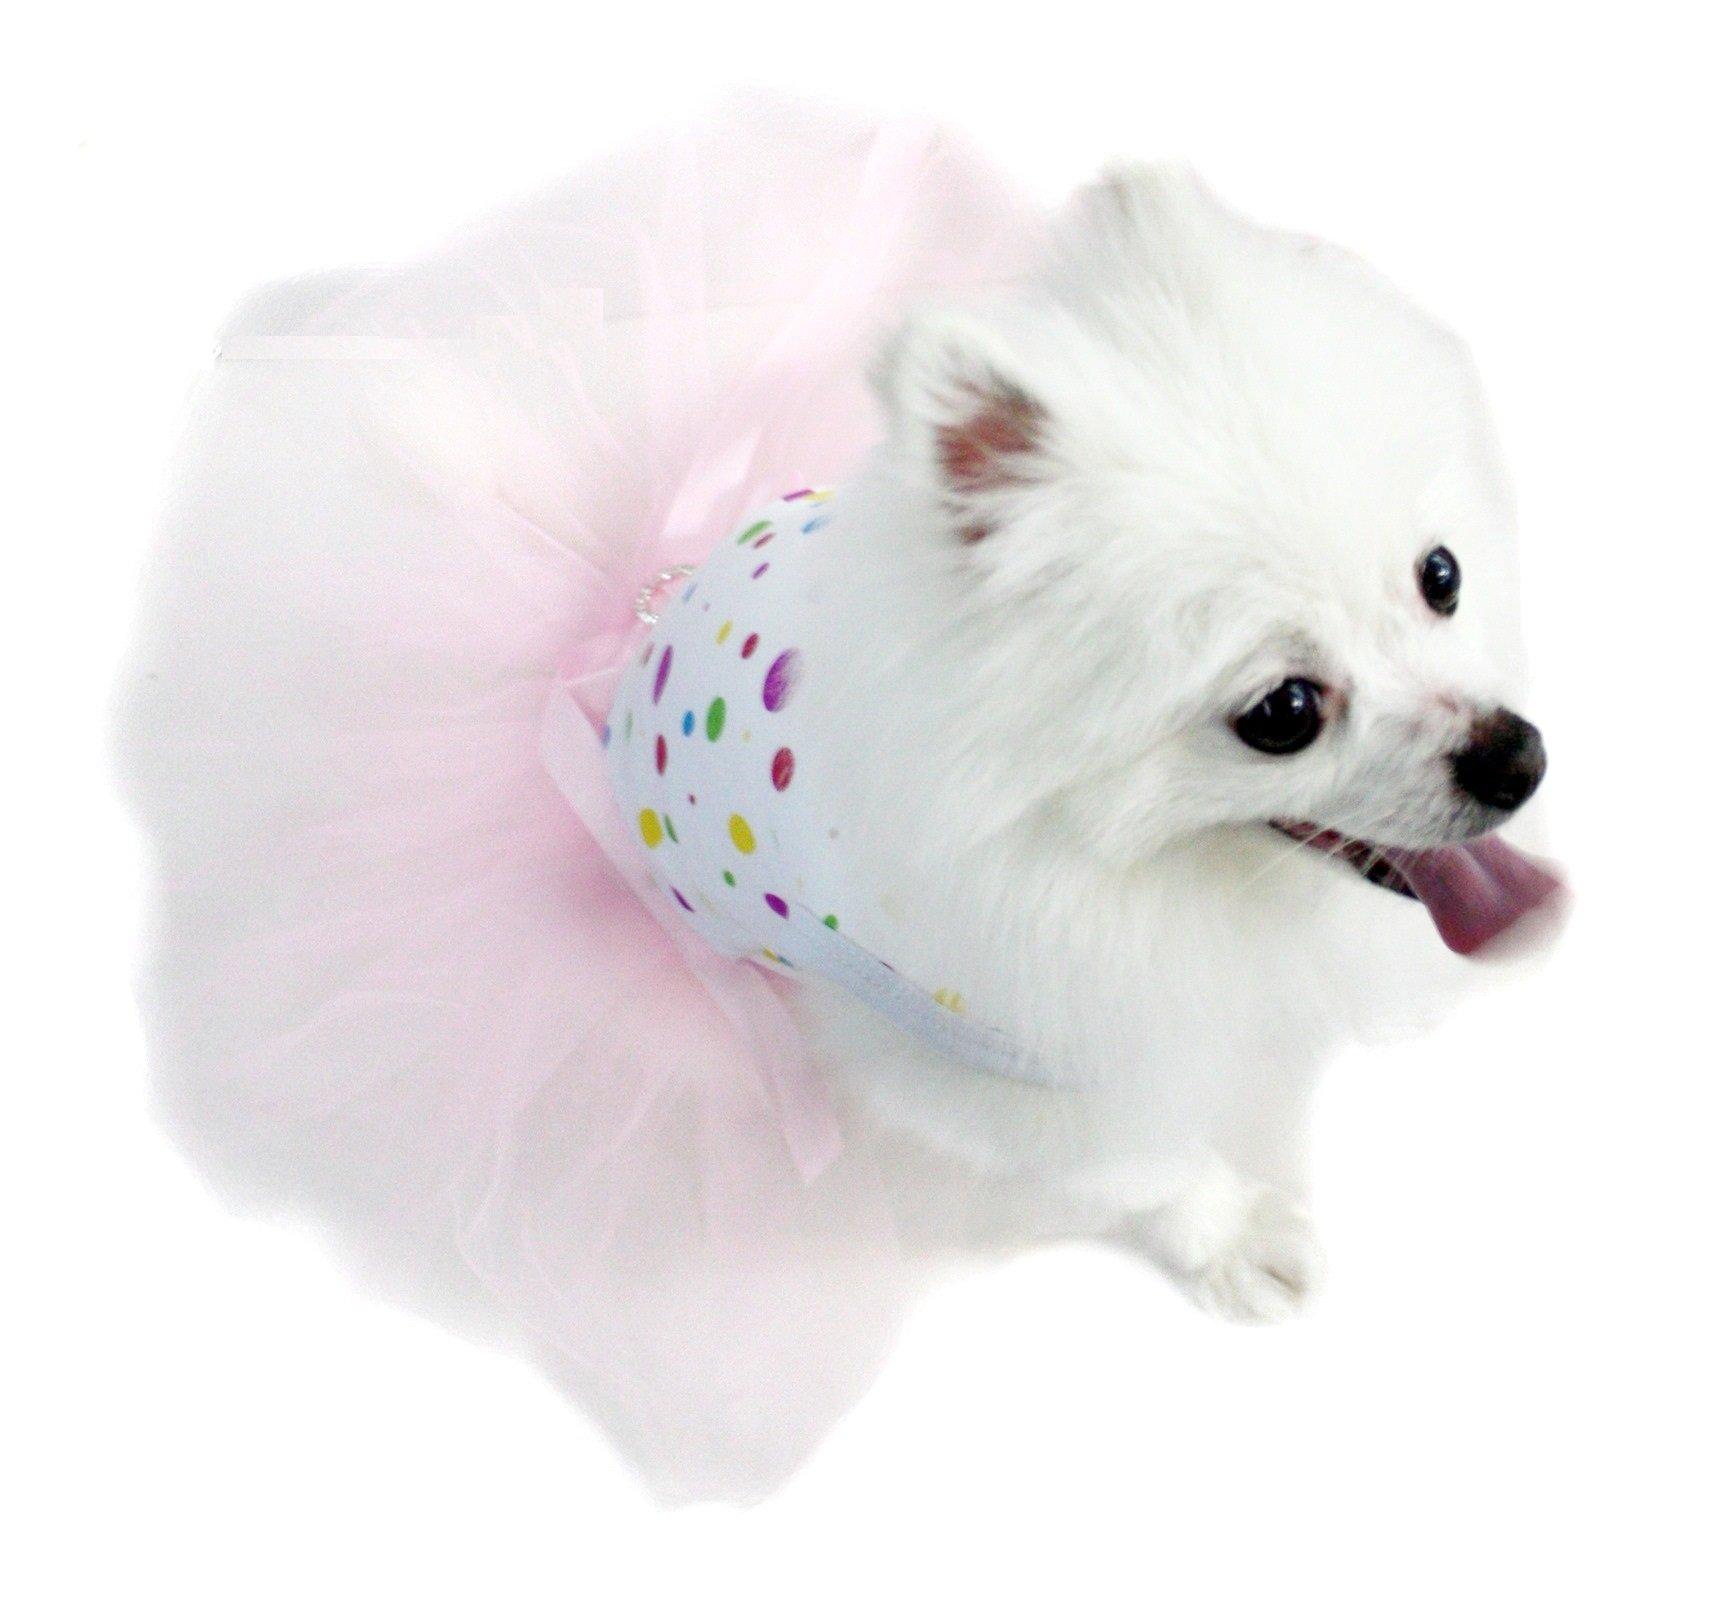 Puppy Clothes Dog Dress Rainbow Polka Dot Cotton Top Light Pink Tutu Animal Wear (Medium)